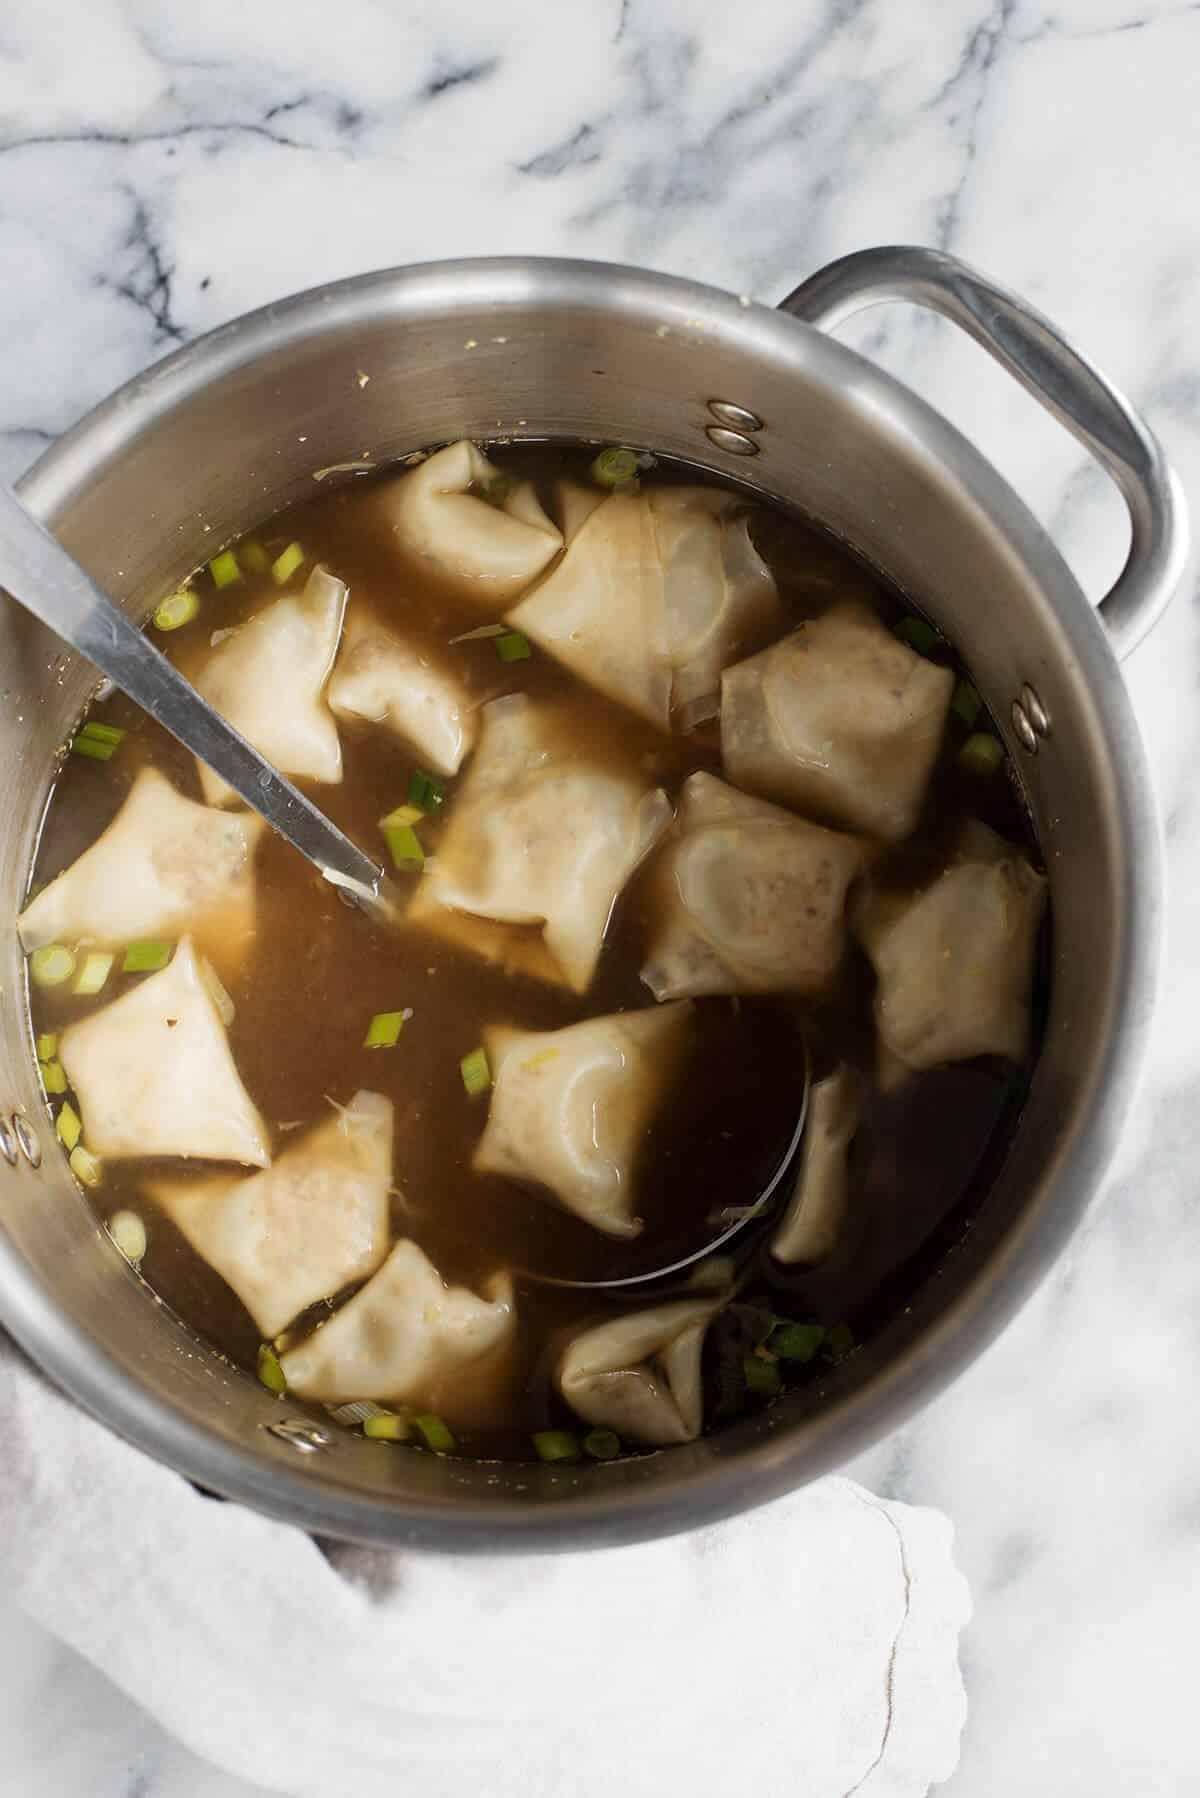 Mushroom Wonton Soup! Homemade wontons with mushrooms and tofu served in a rich mushroom broth. A vegetarian and vegan must! | www.delishknowledge.com